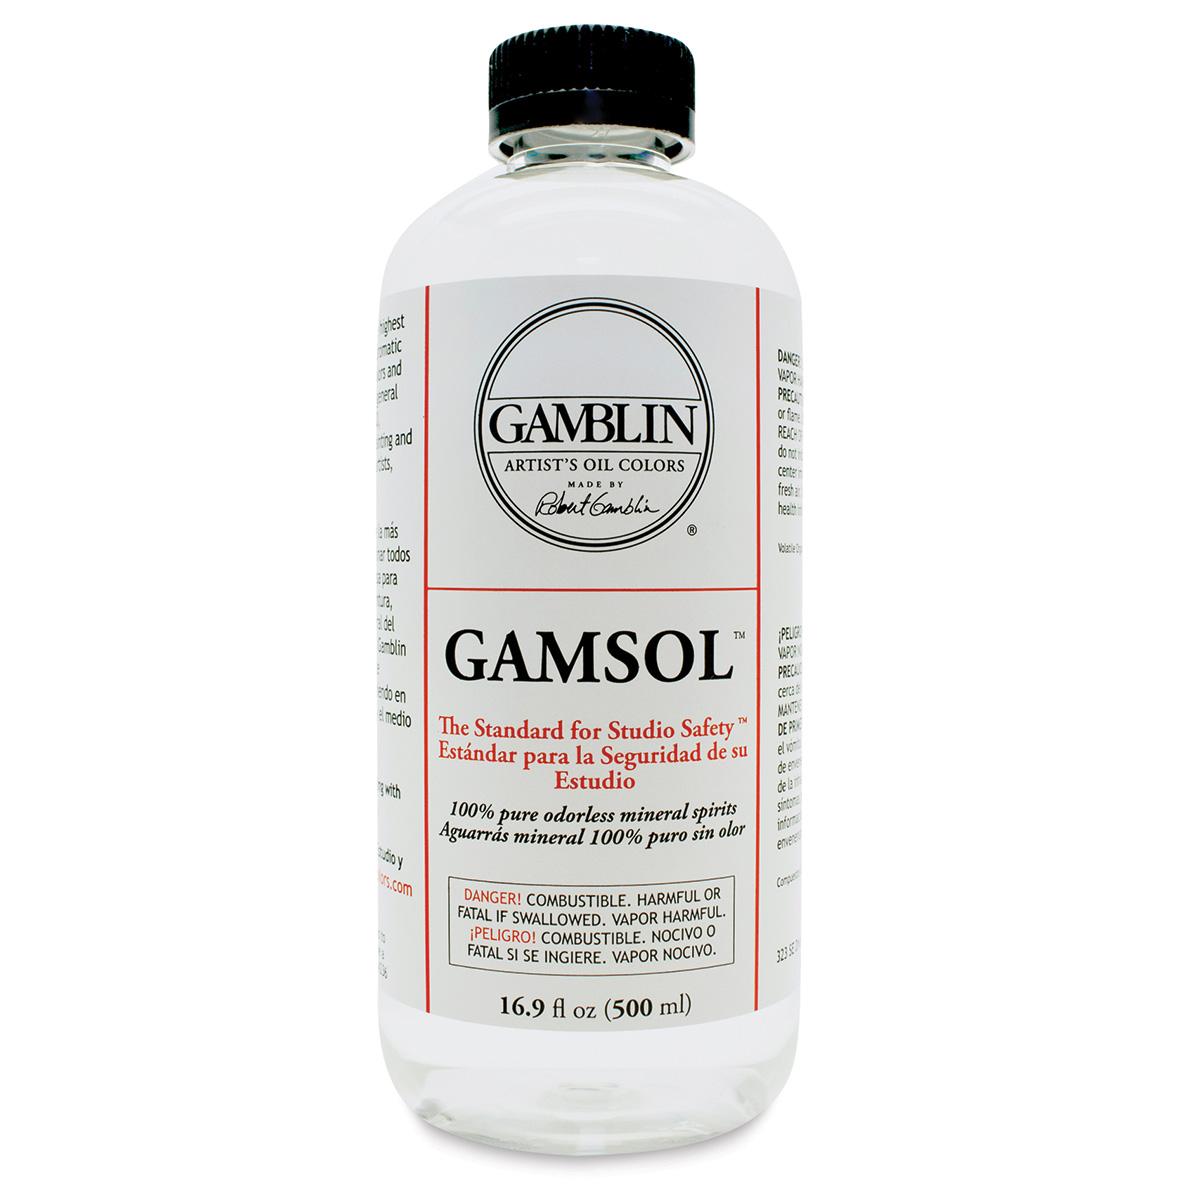 Gamblin Gamsol Odorless Mineral Spirits - 16.9 oz bottle